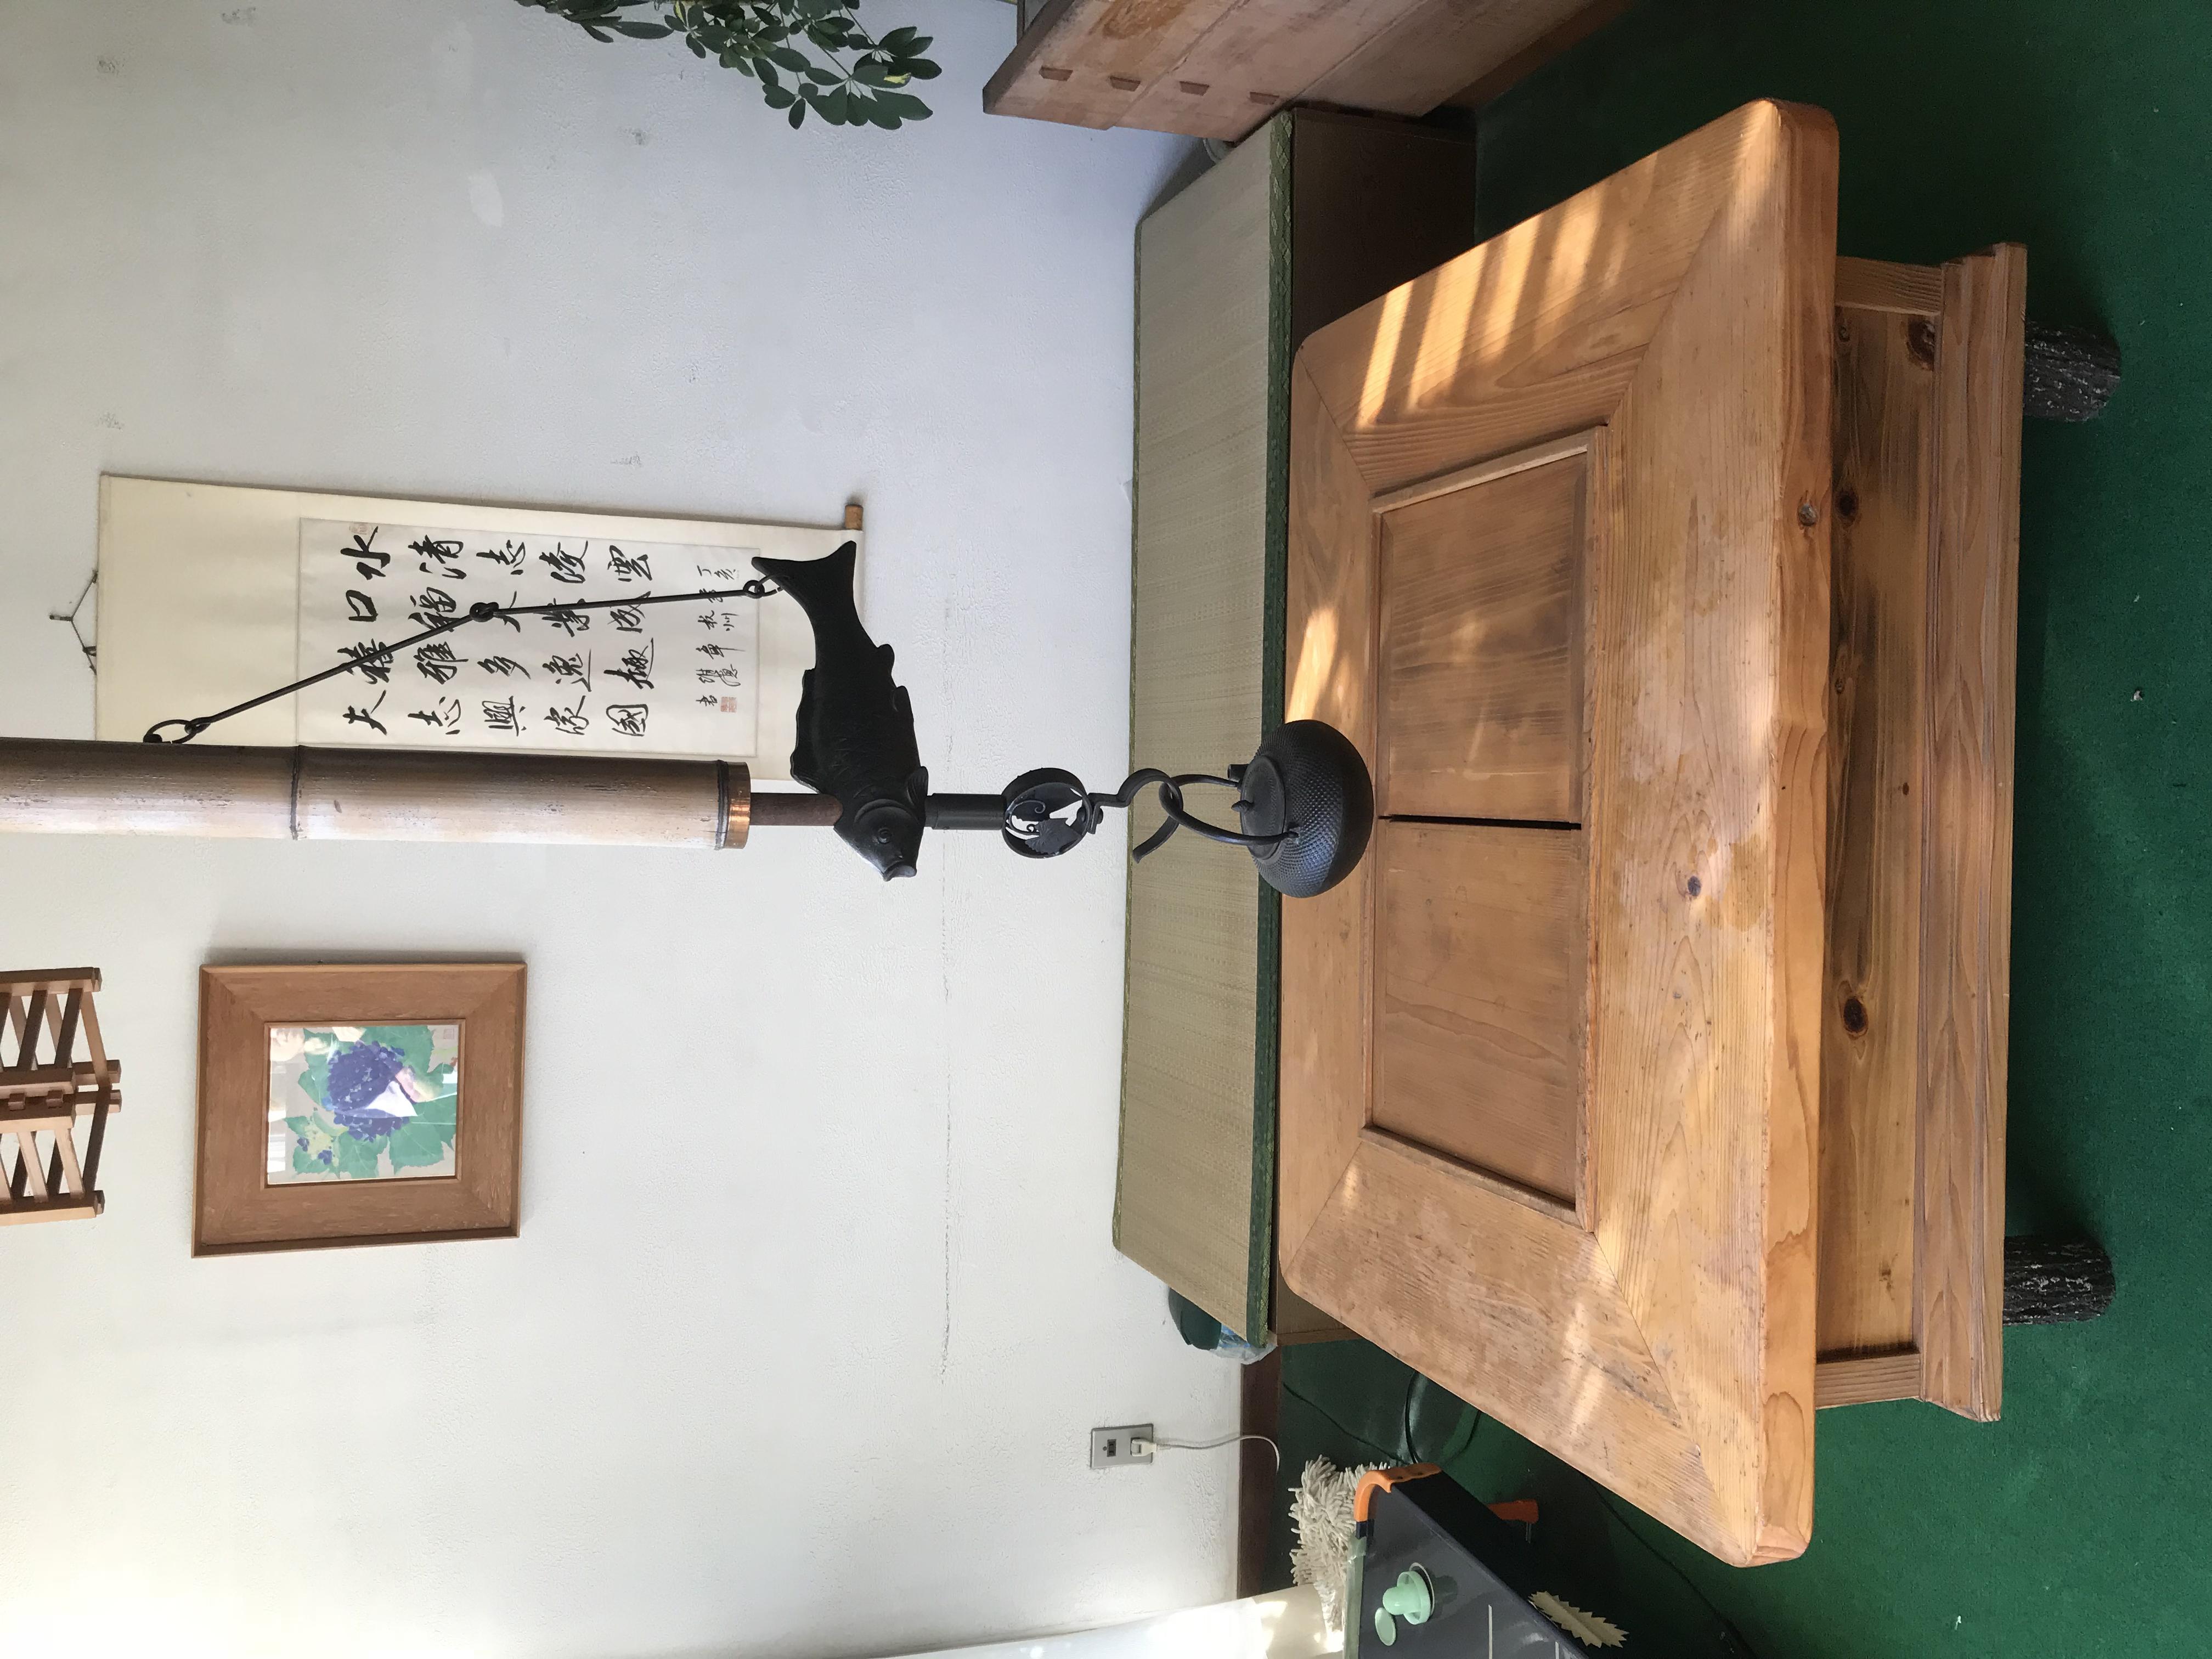 竹倉温泉の待合室